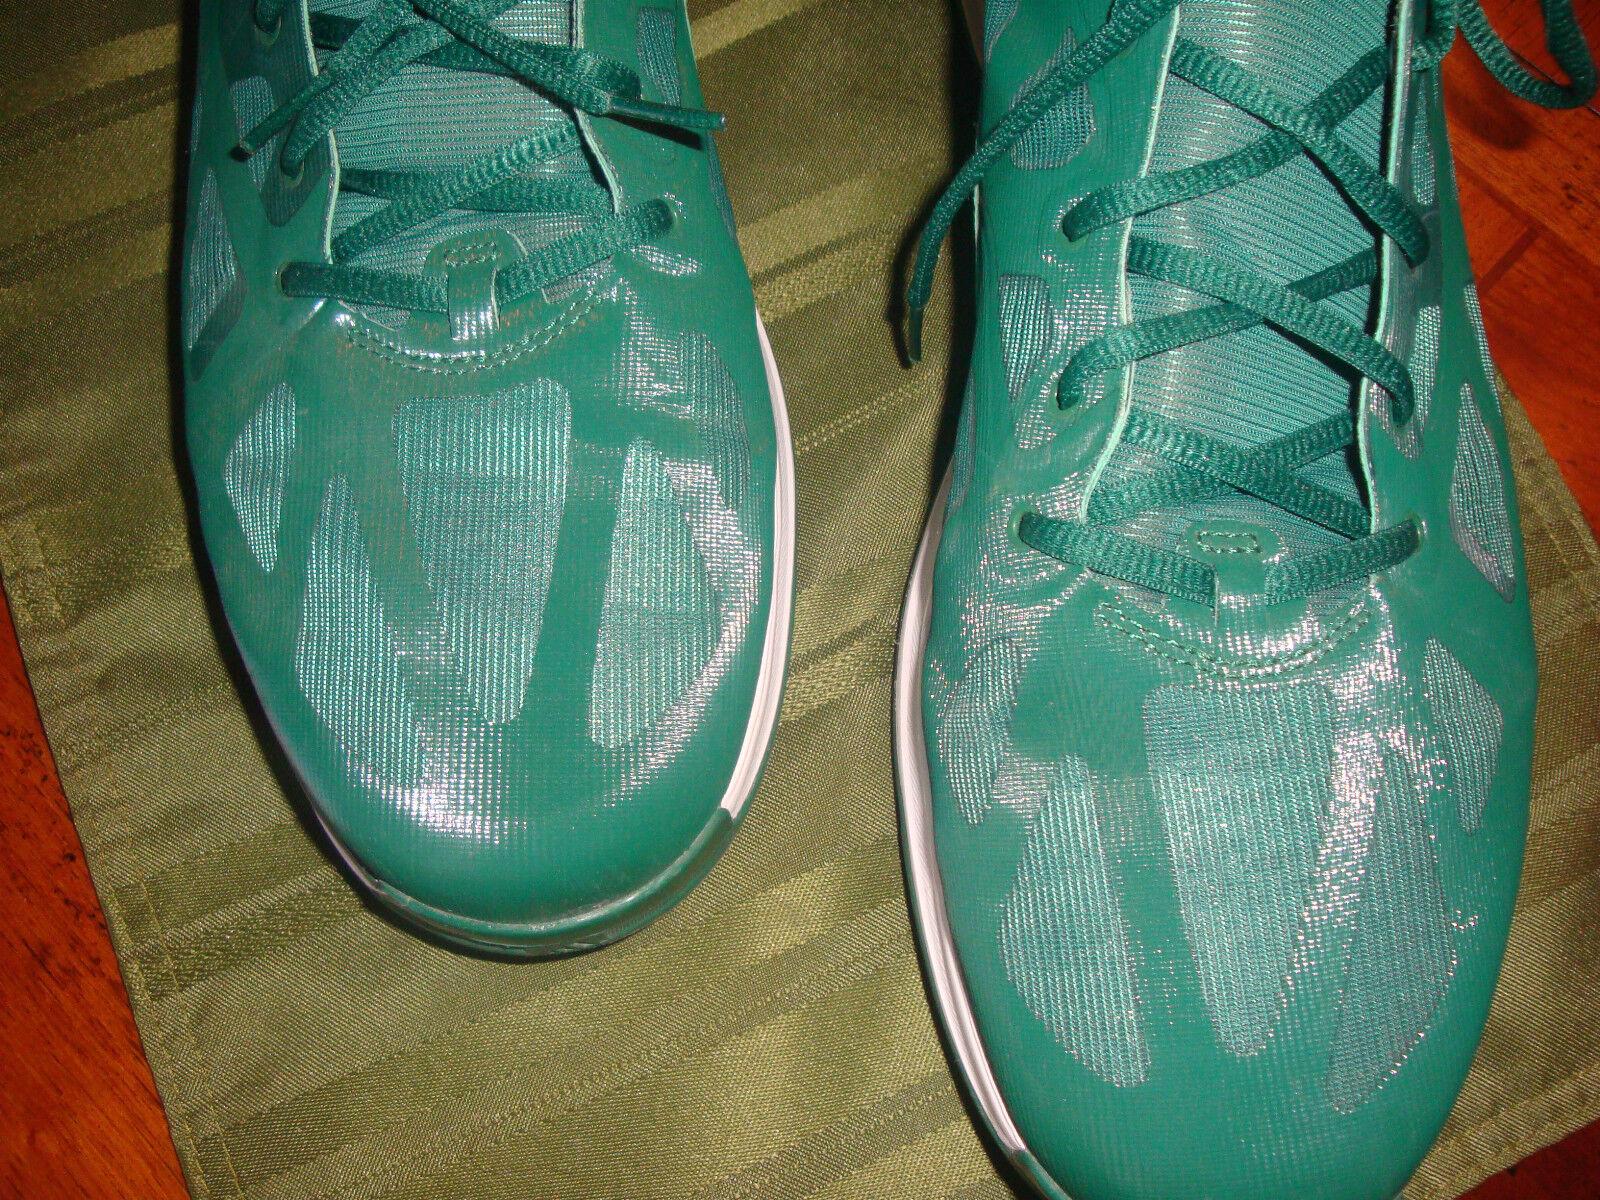 ADIDAS Mens Basketball shoes Derrick Rose Size 18 Crazy Shadow Shadow Crazy 2 Q33385 779001 9a2f45